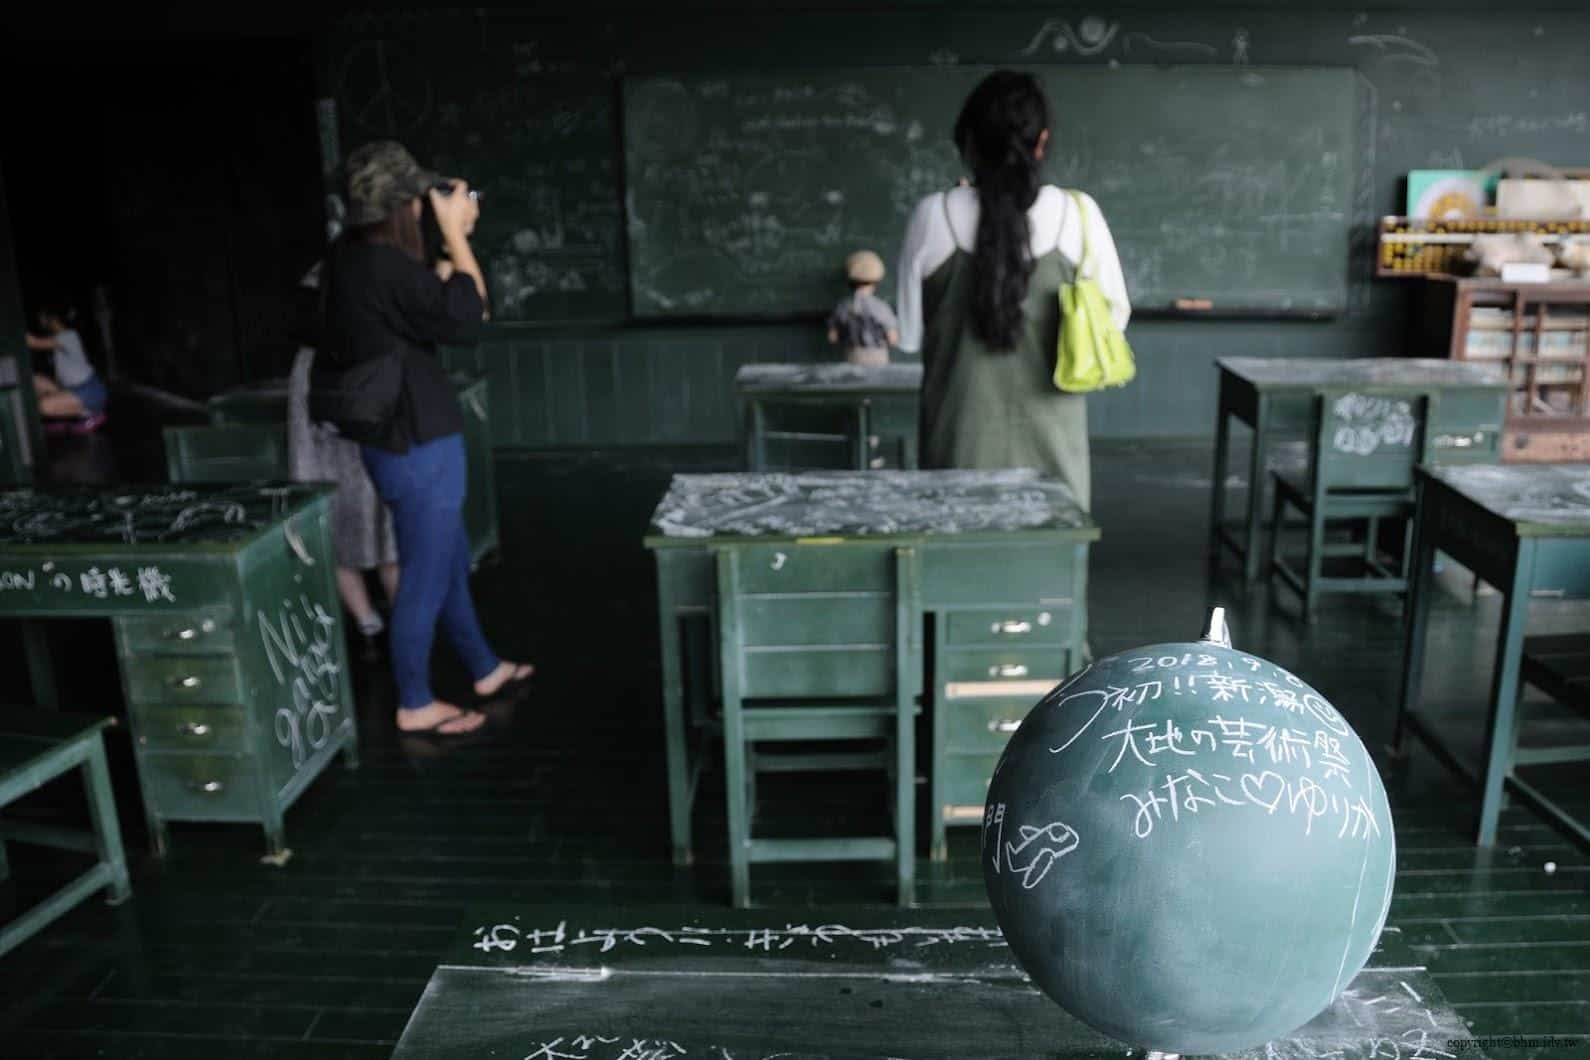 MVRDV,松代雪國農耕文化村[農舞臺],関係-黒板の教室」(教育空間),「如果教室內全都是黑板?那該有多好」於是,作者創作出此作品,無論所見之處牆壁、地板、地圖、地球儀等,所有物品都可以使用粉筆寫字畫圖 松代雪國農耕文化村[農舞臺] 松代雪國農耕文化村[農舞臺] no butai snow land agrarian culture center matsudai 12